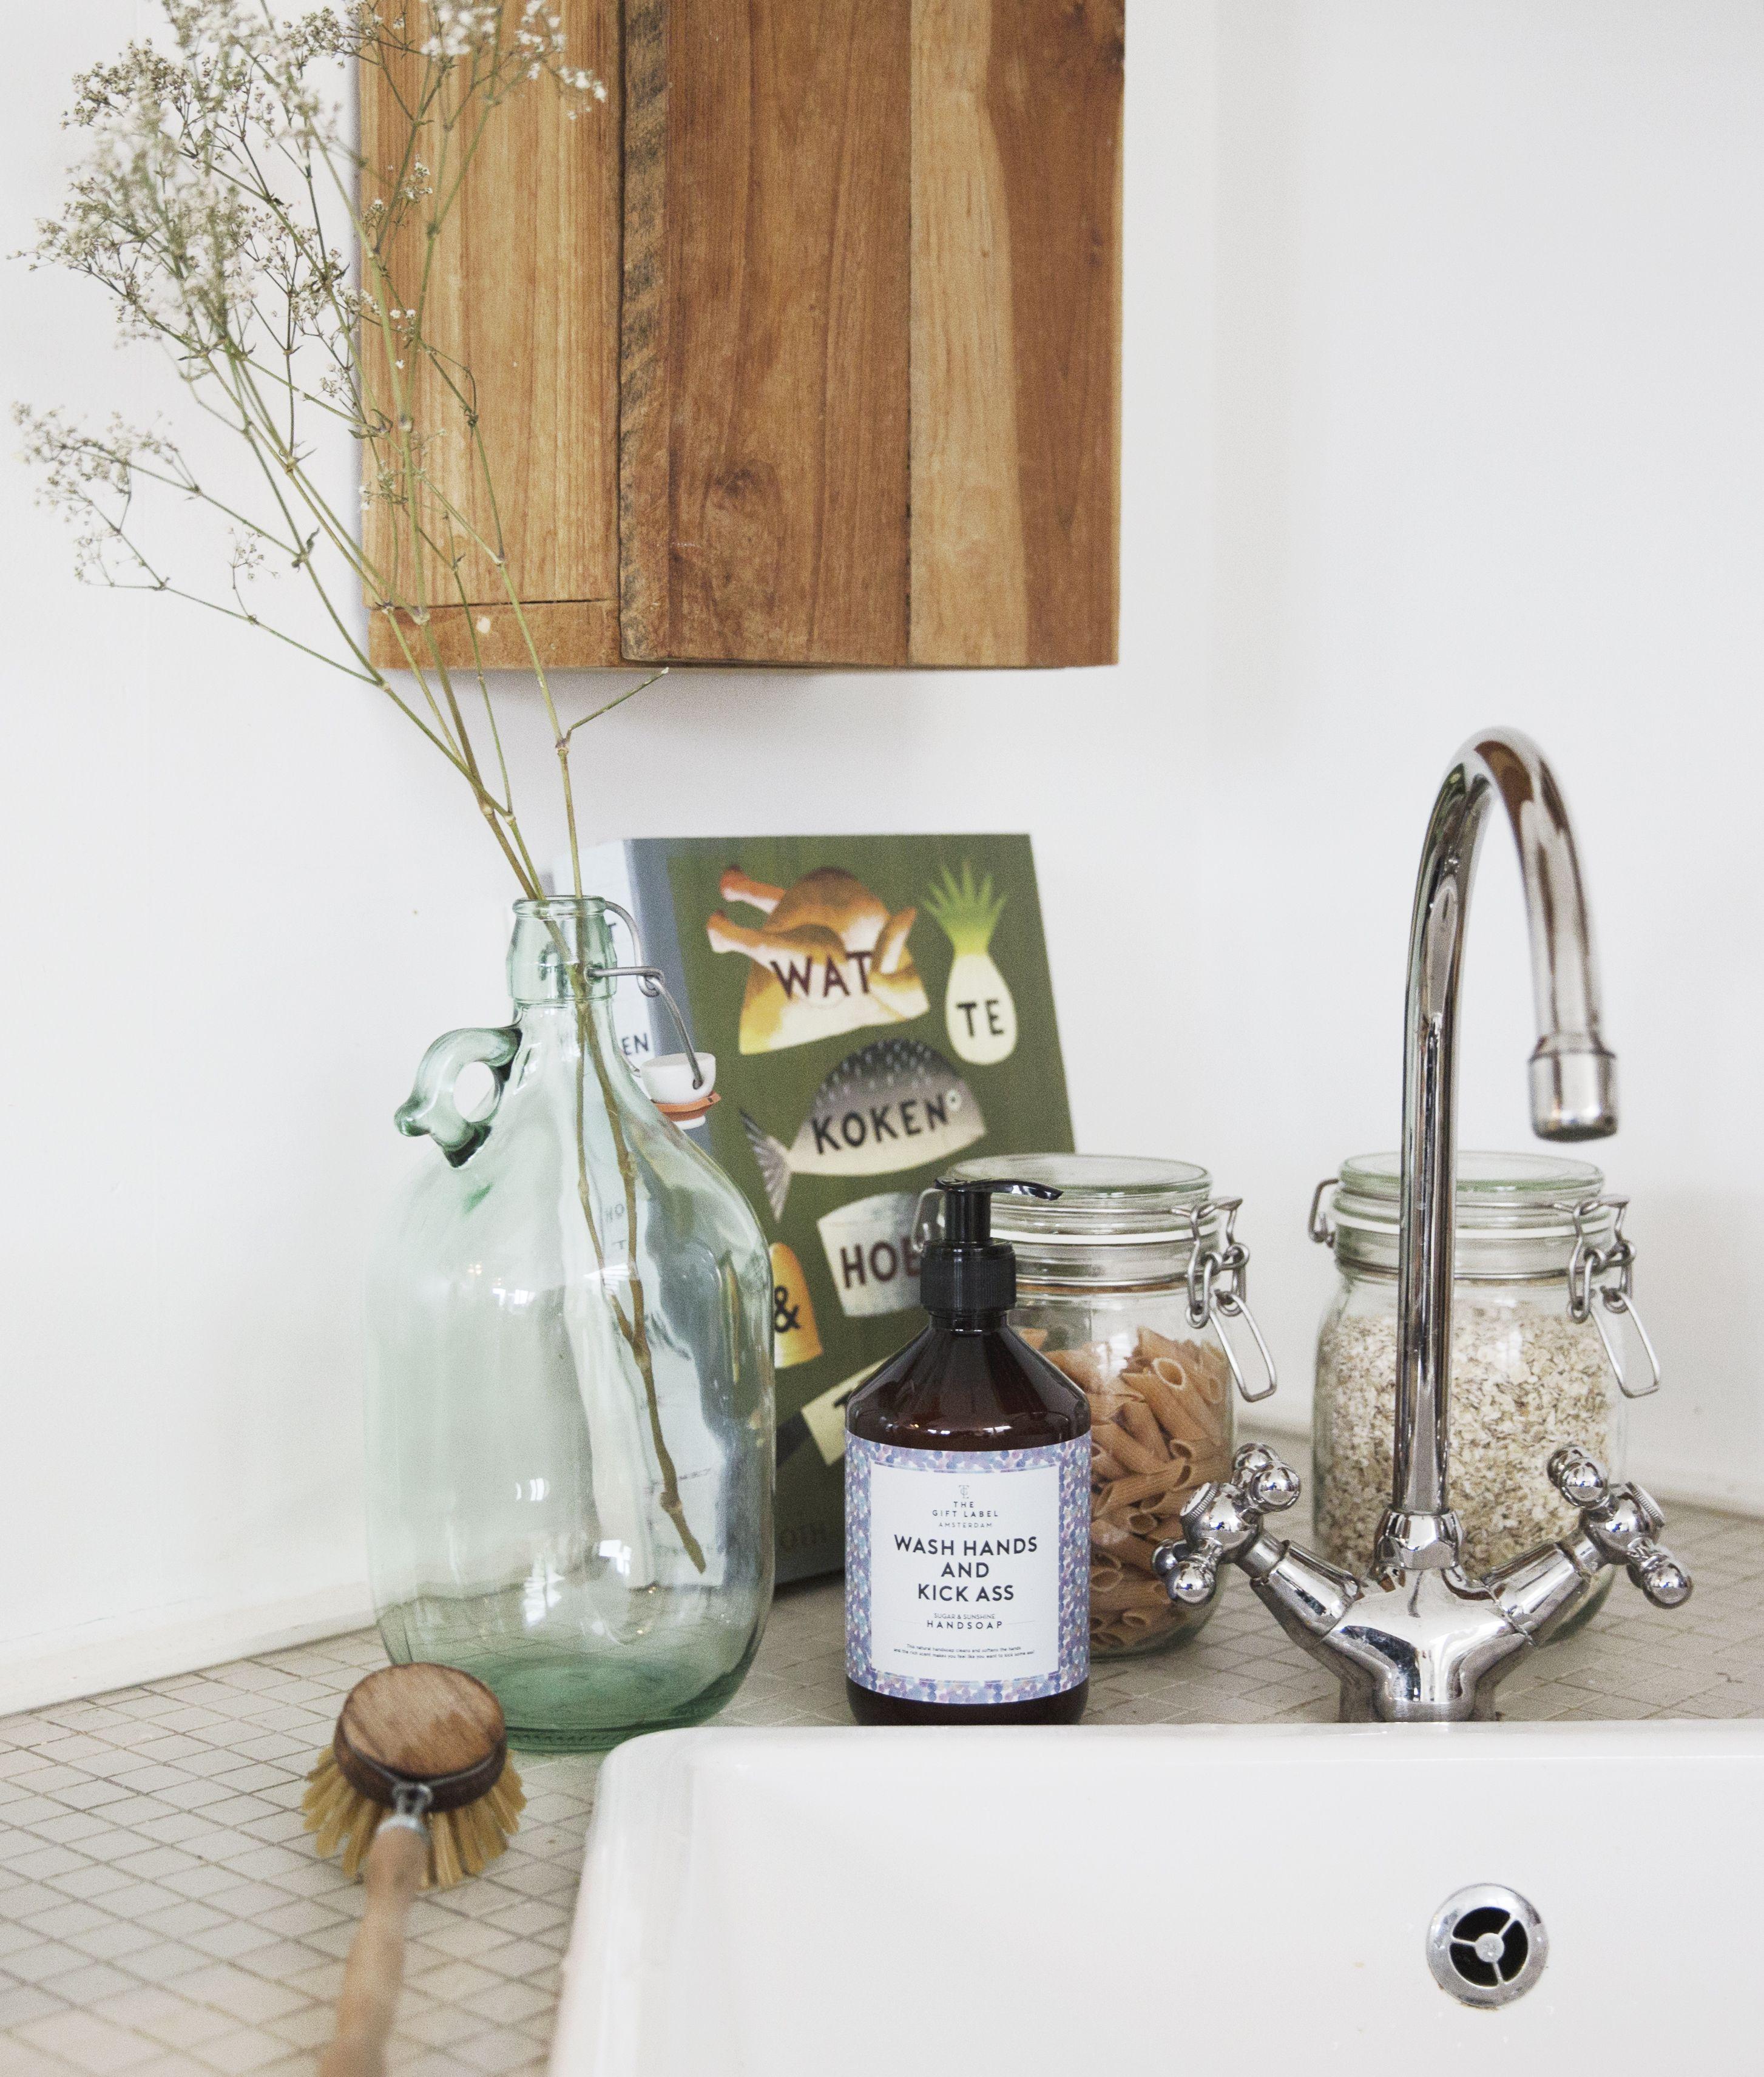 TheGiftLabel: Wash Hands And Kick Ass! #Handsoap #Kitchen ...